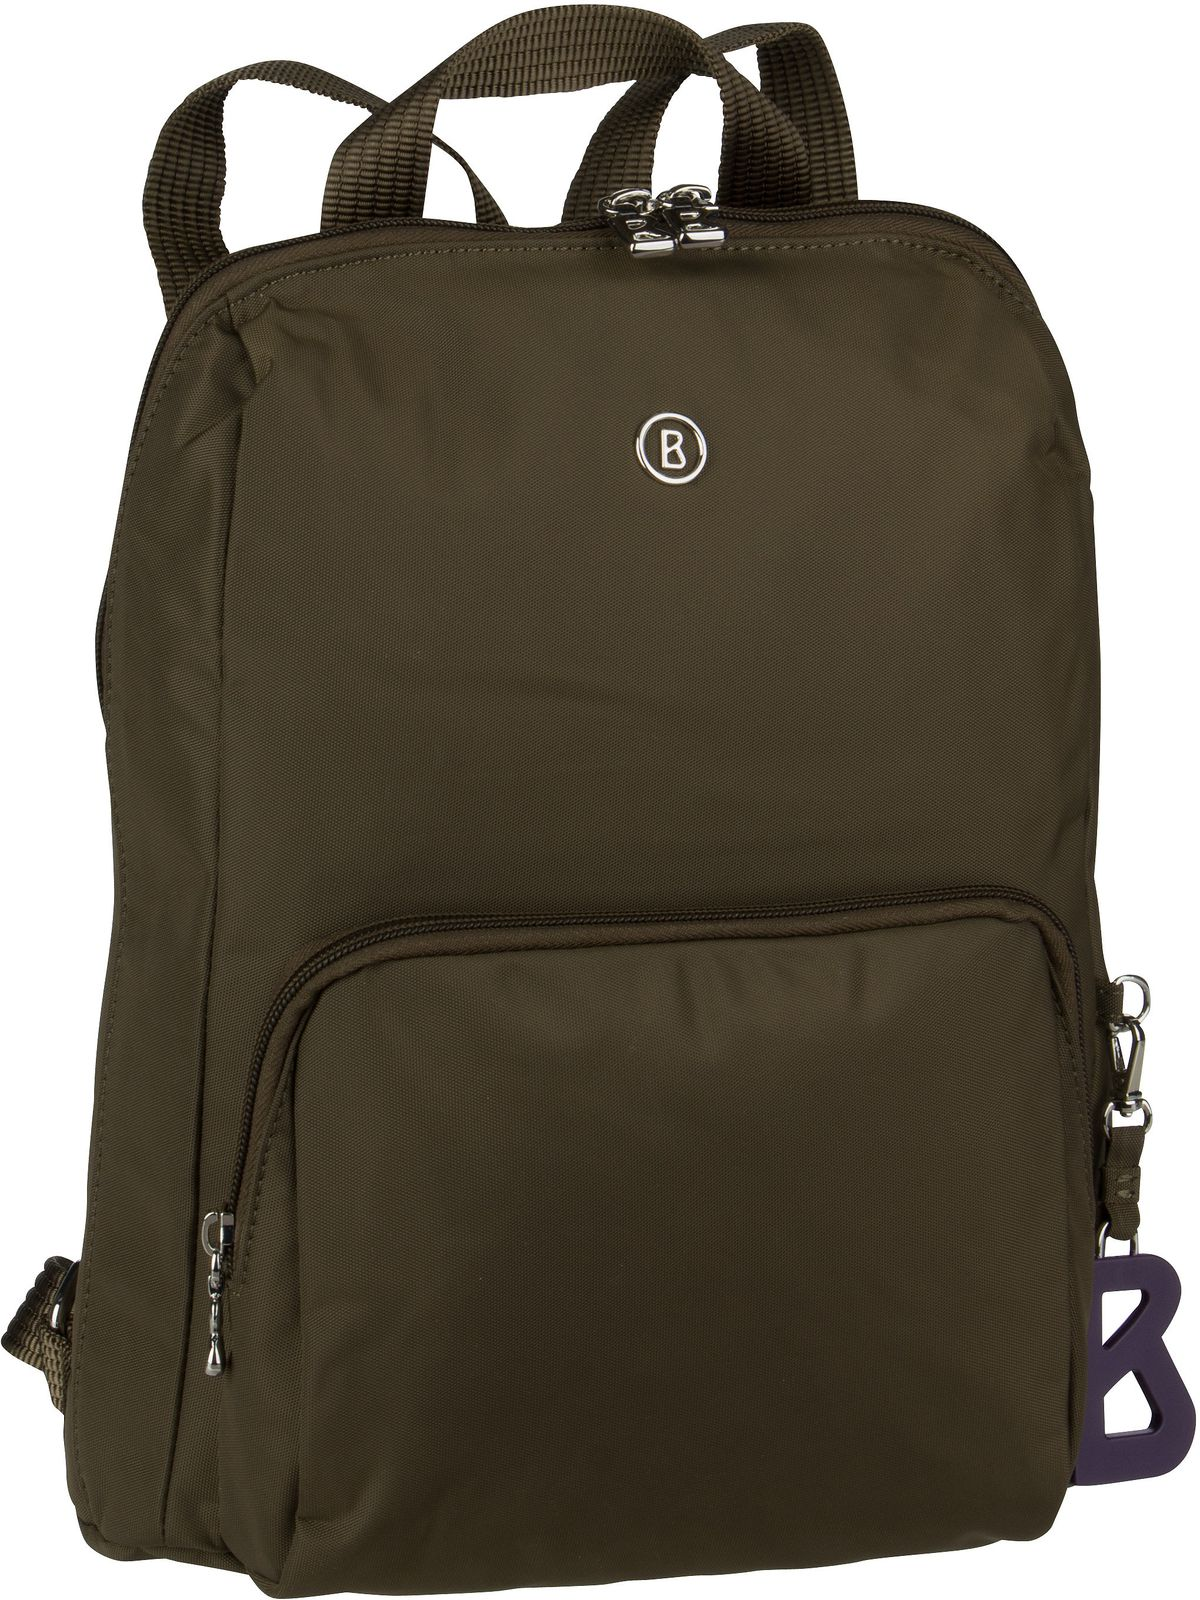 Rucksack / Daypack Verbier Maxi Backpack MVZ Khaki